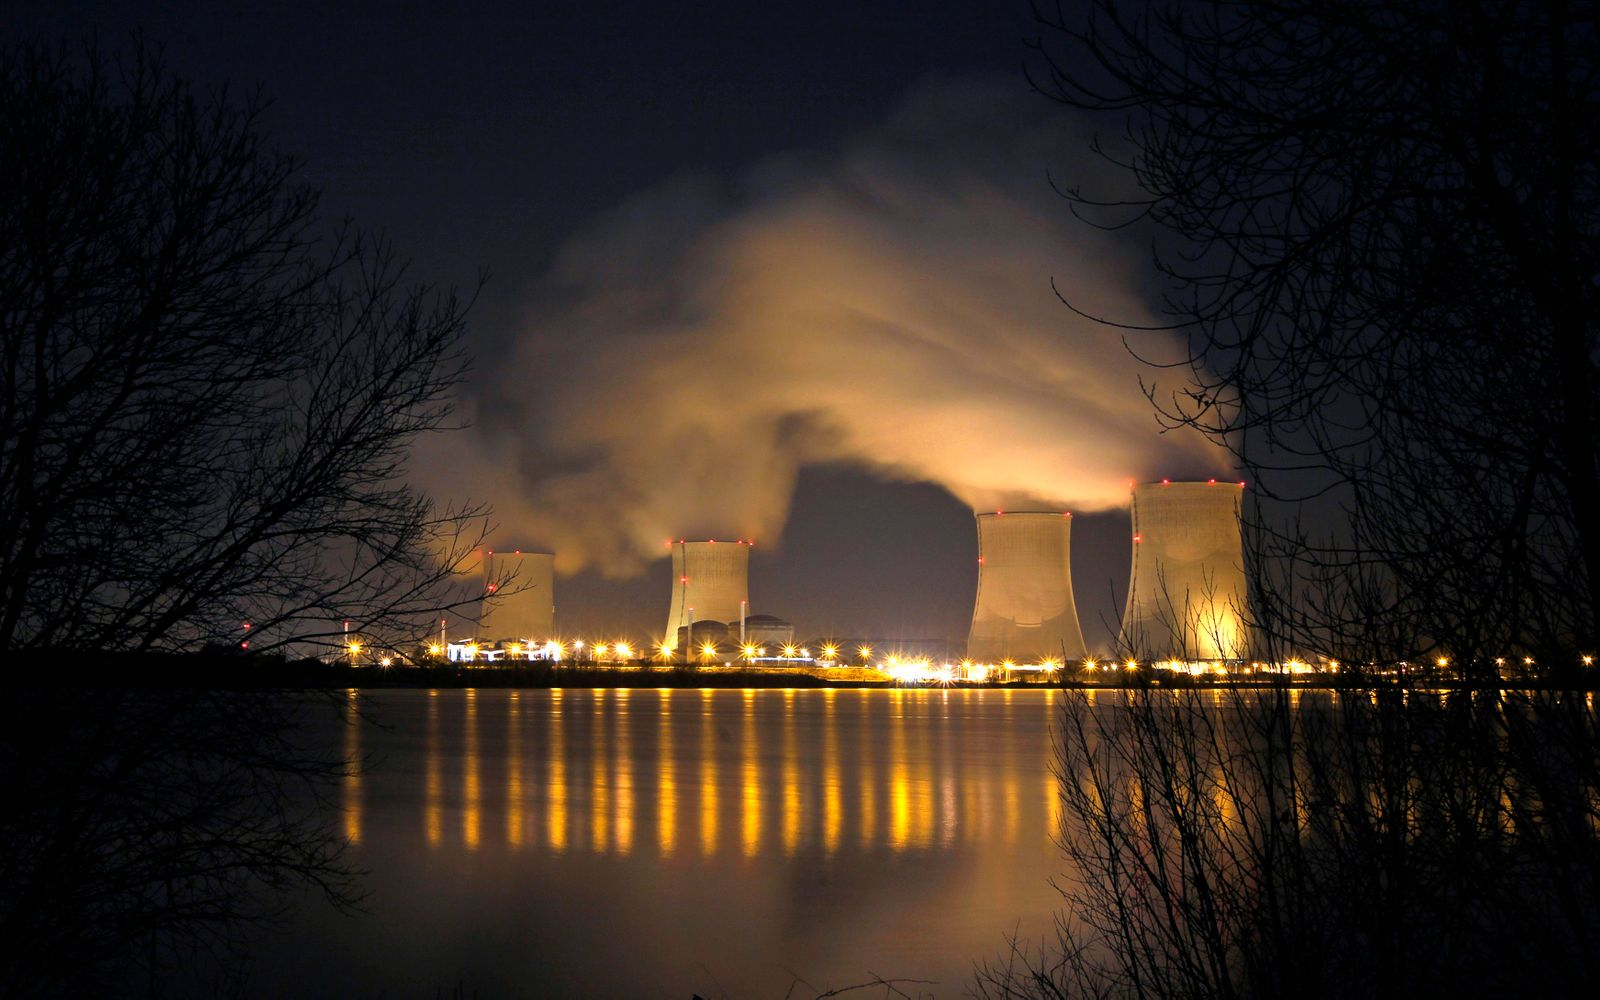 Frankreich / Atomstrom / Atomkraftwerke / AKW